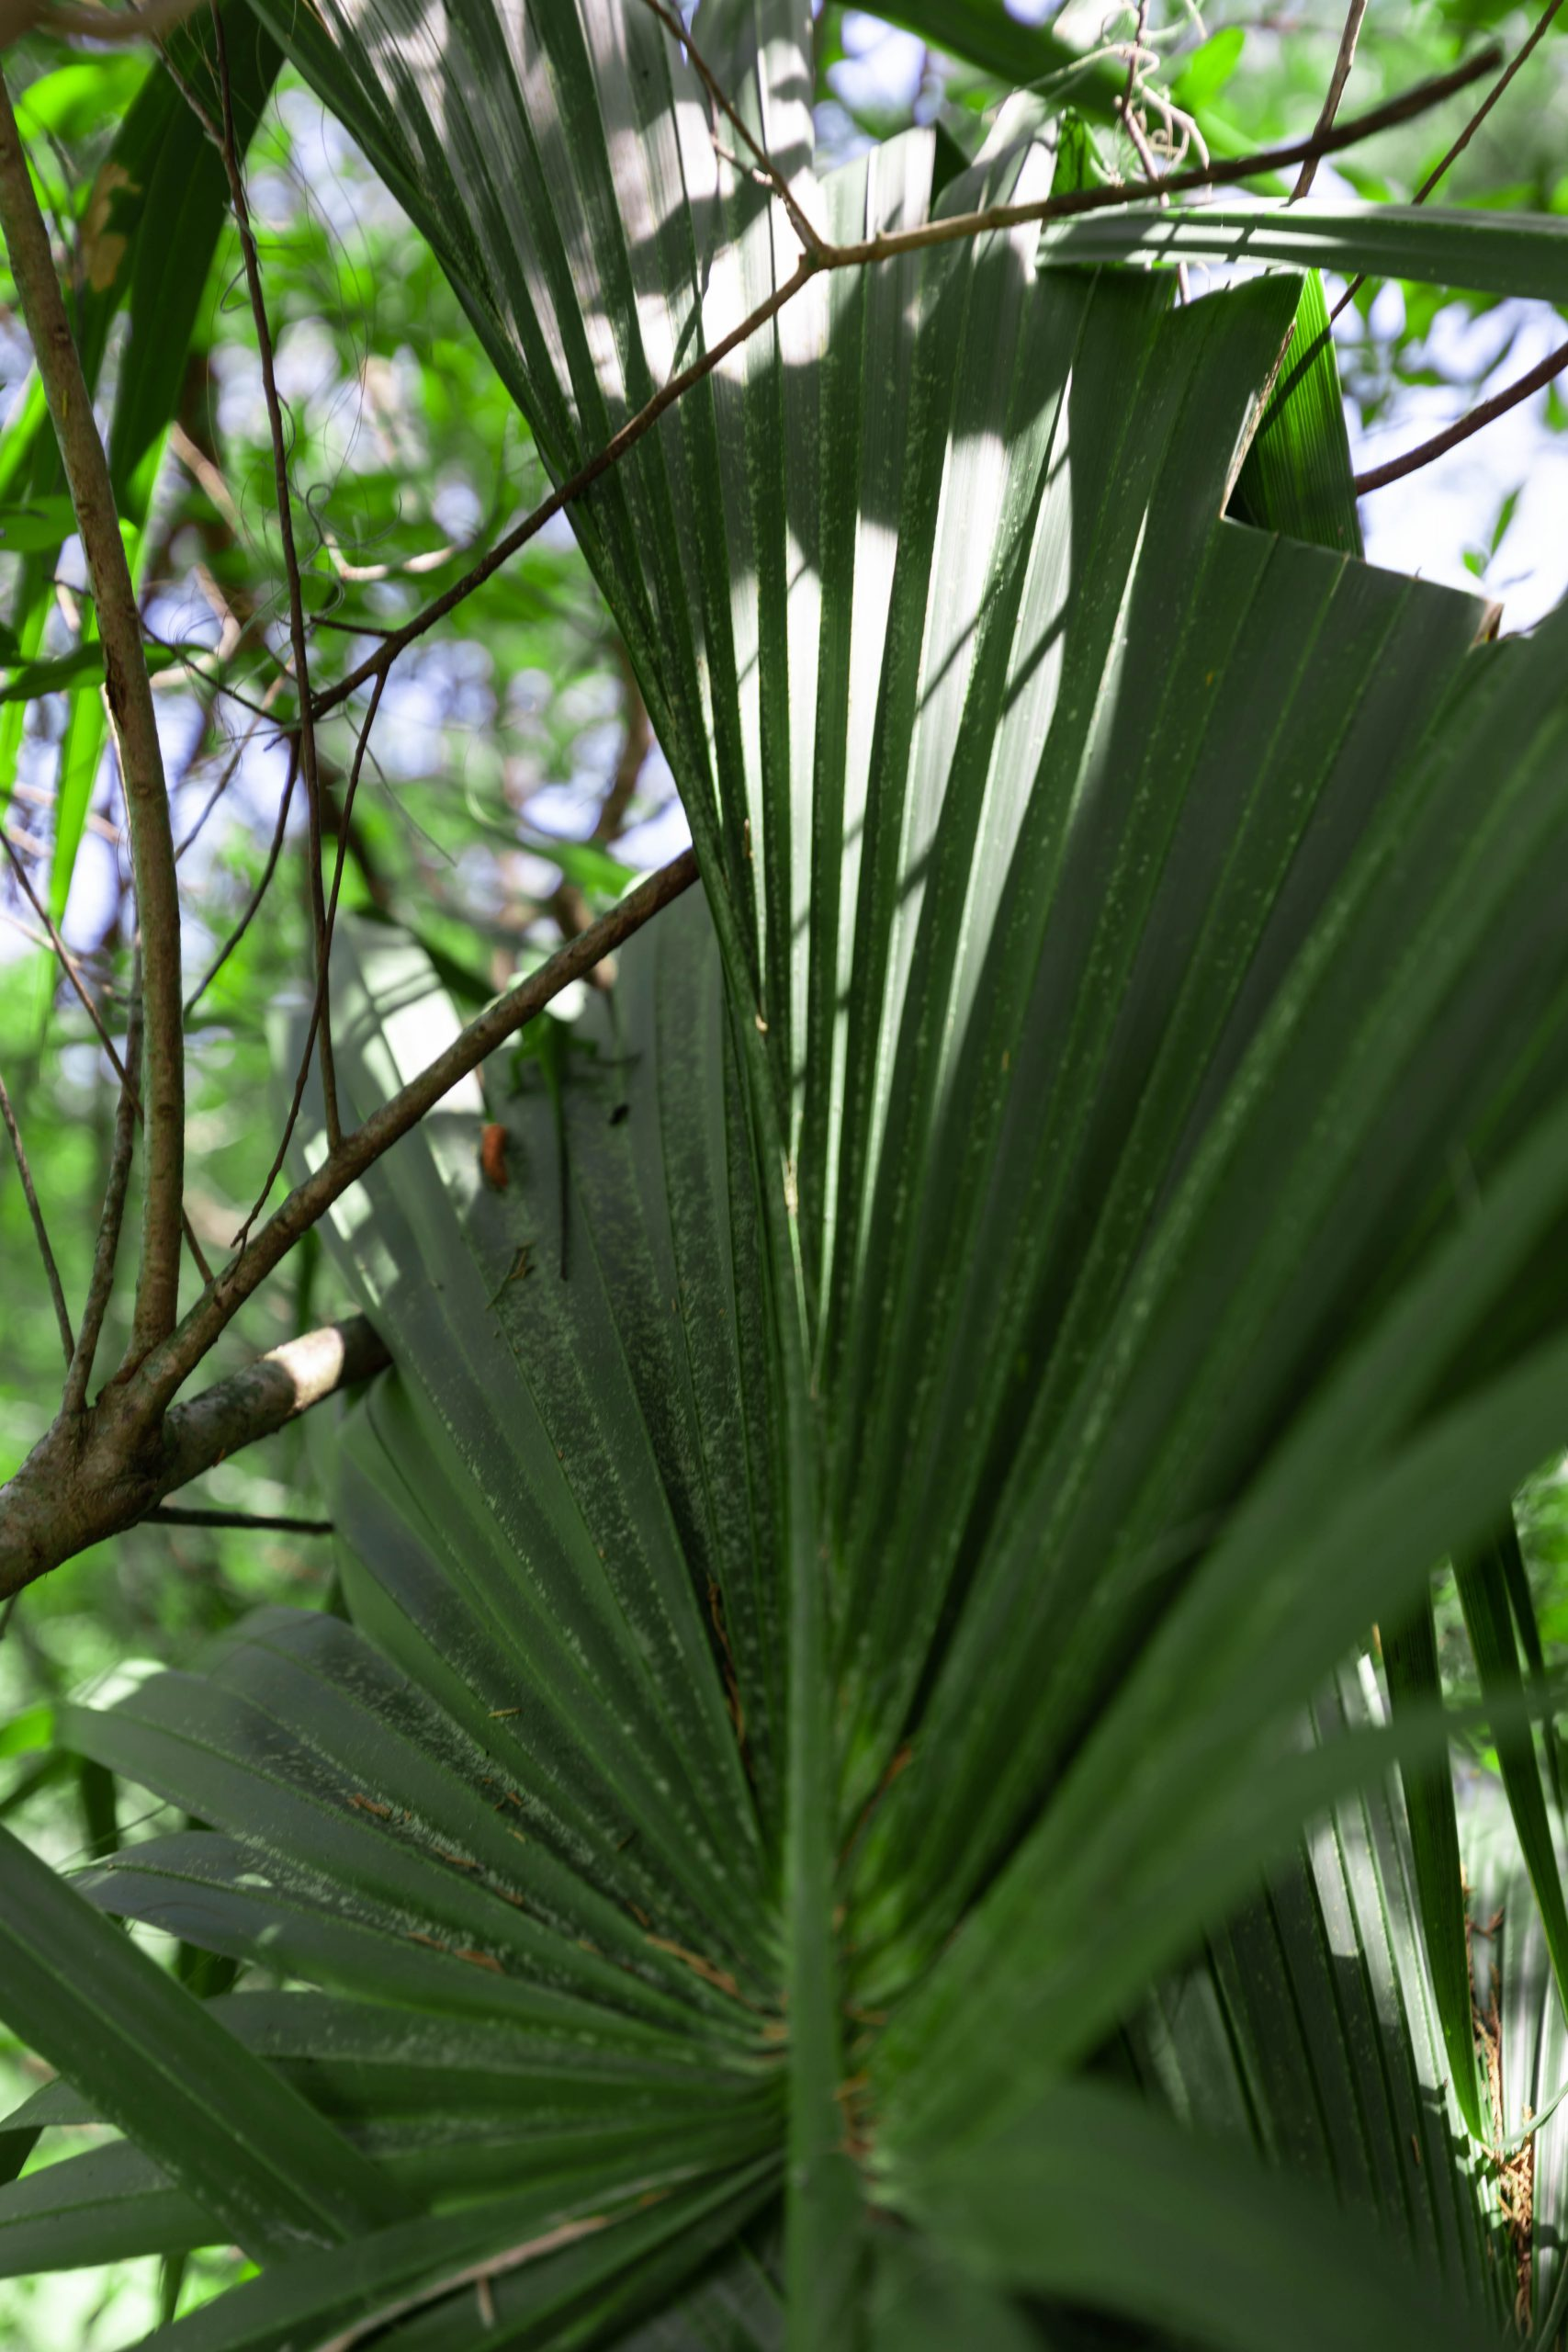 Audubon Swamp Garden Inside Magnolia Plantation in Charleston, South Carolina Photographed by Luxury Travel Writer and Photographer Annie Fairfax